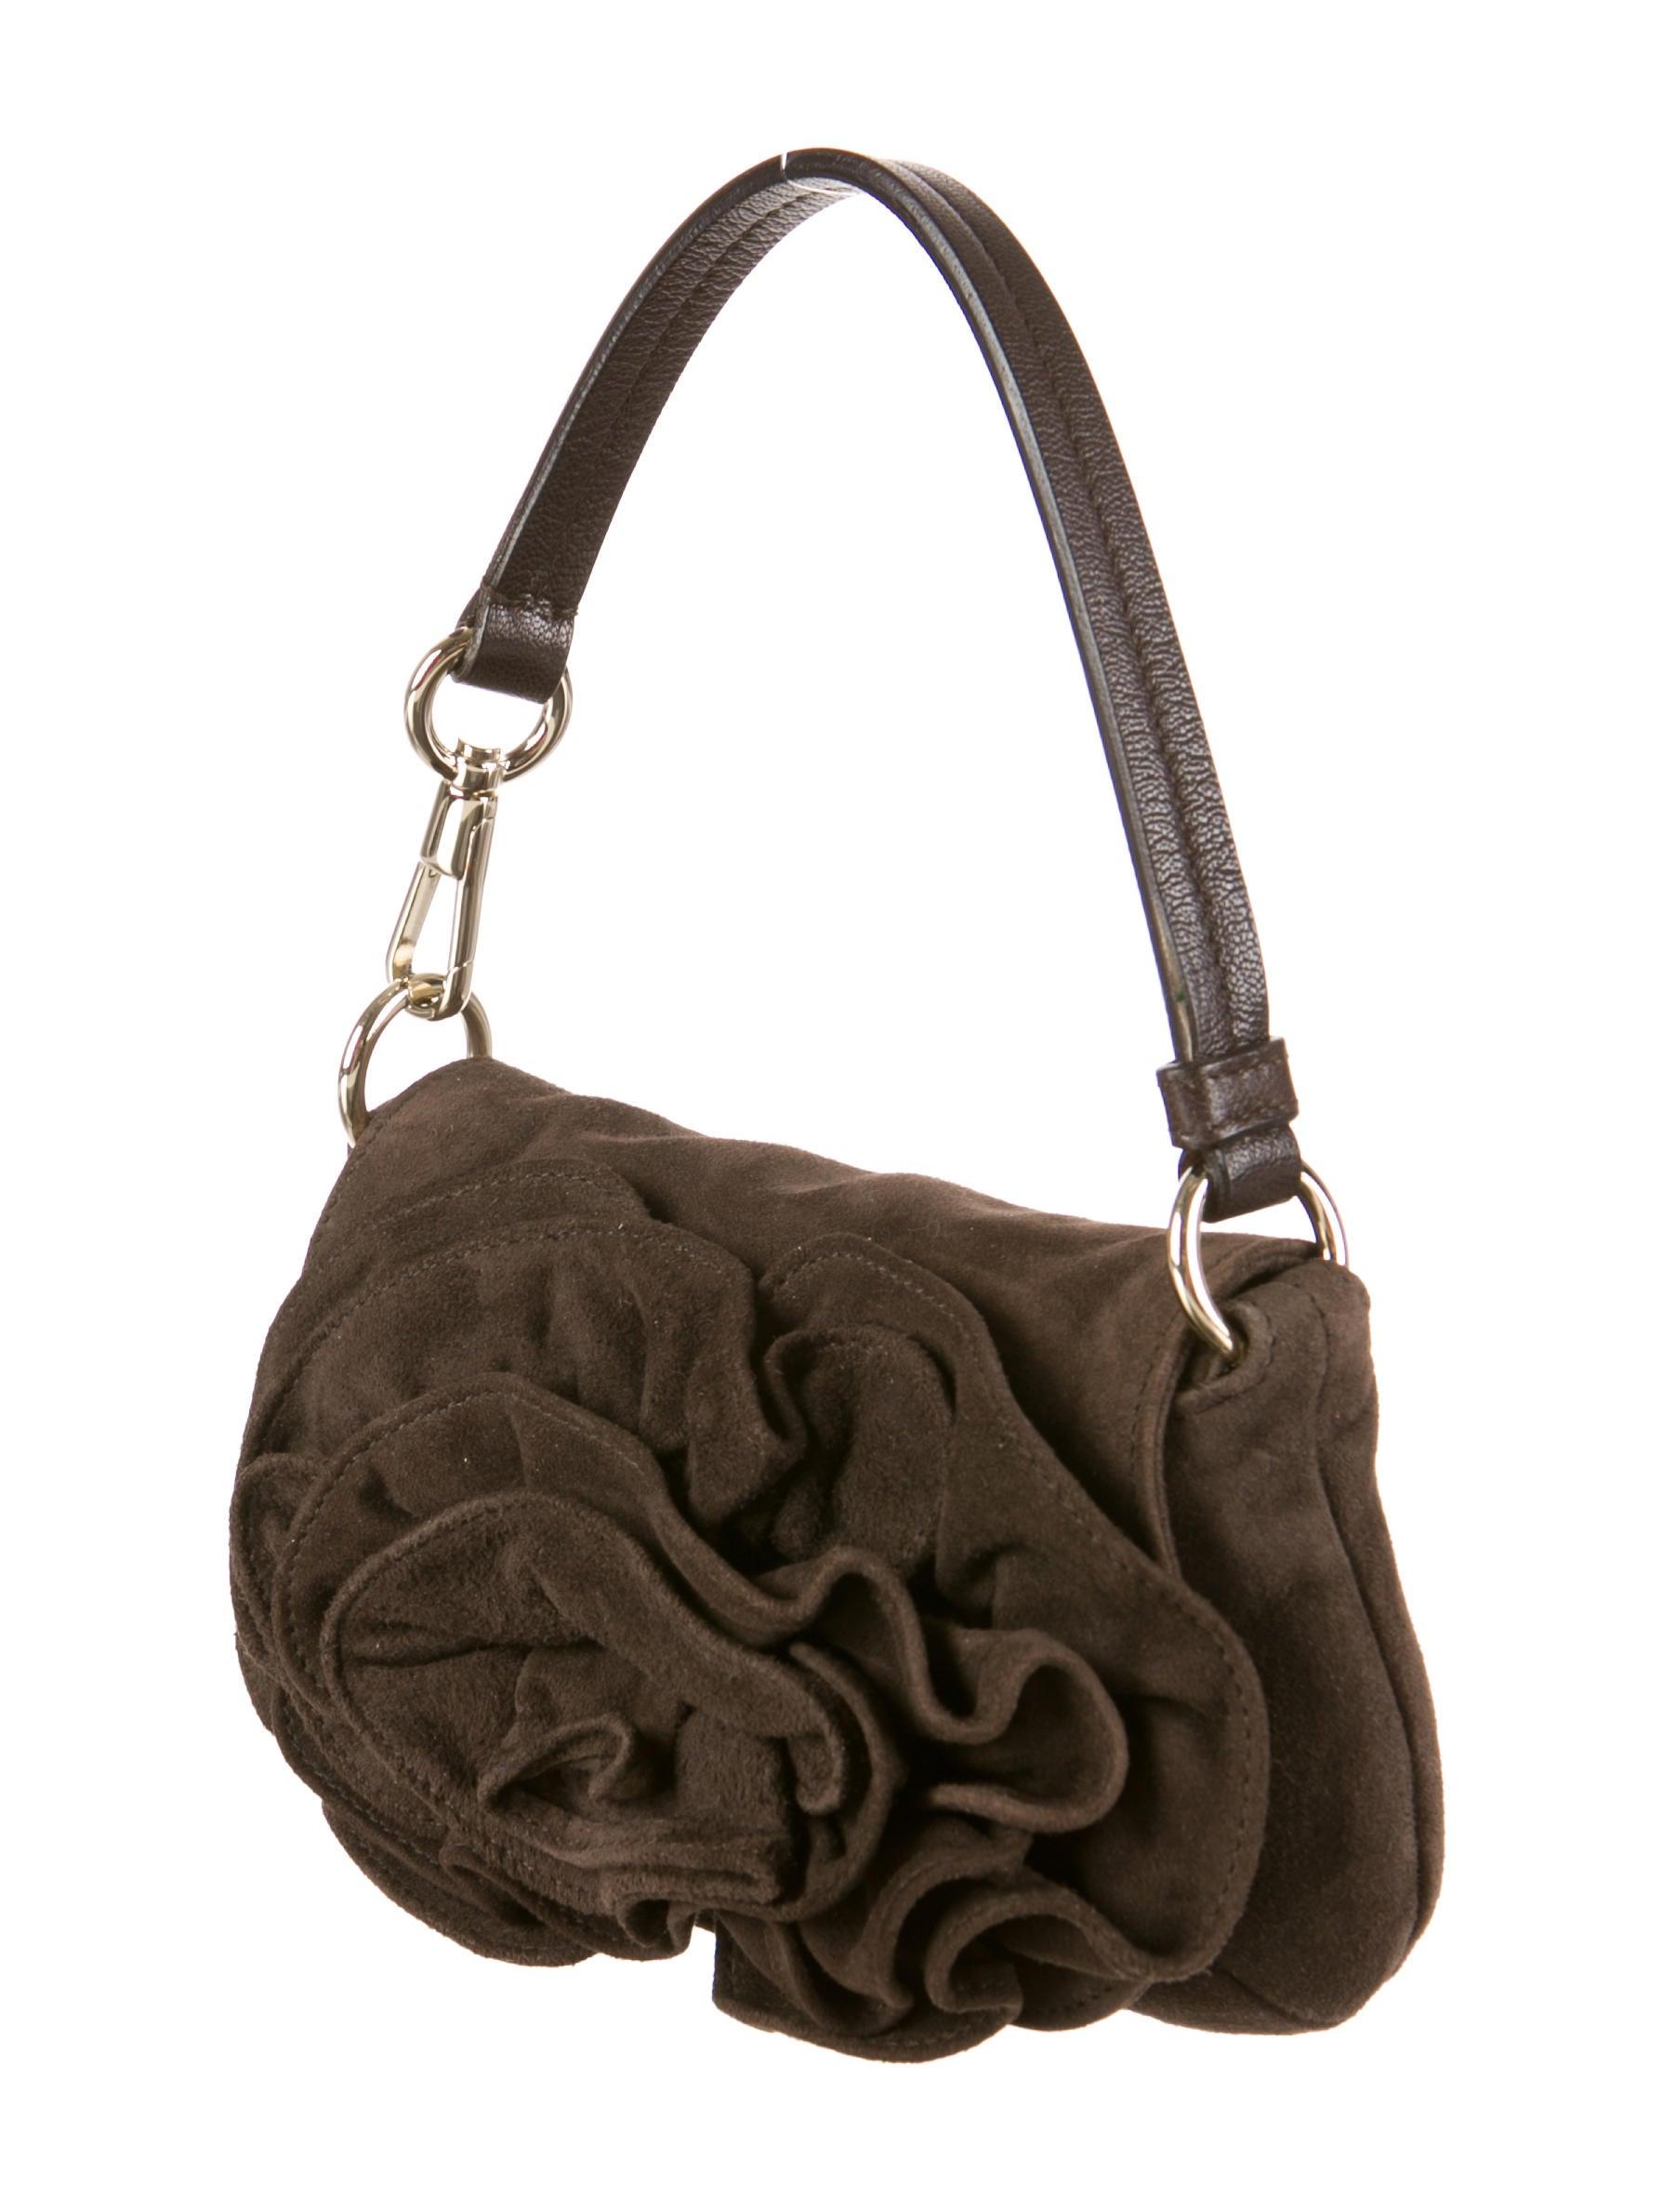 Yves Saint Laurent Handle Bag - Handbags